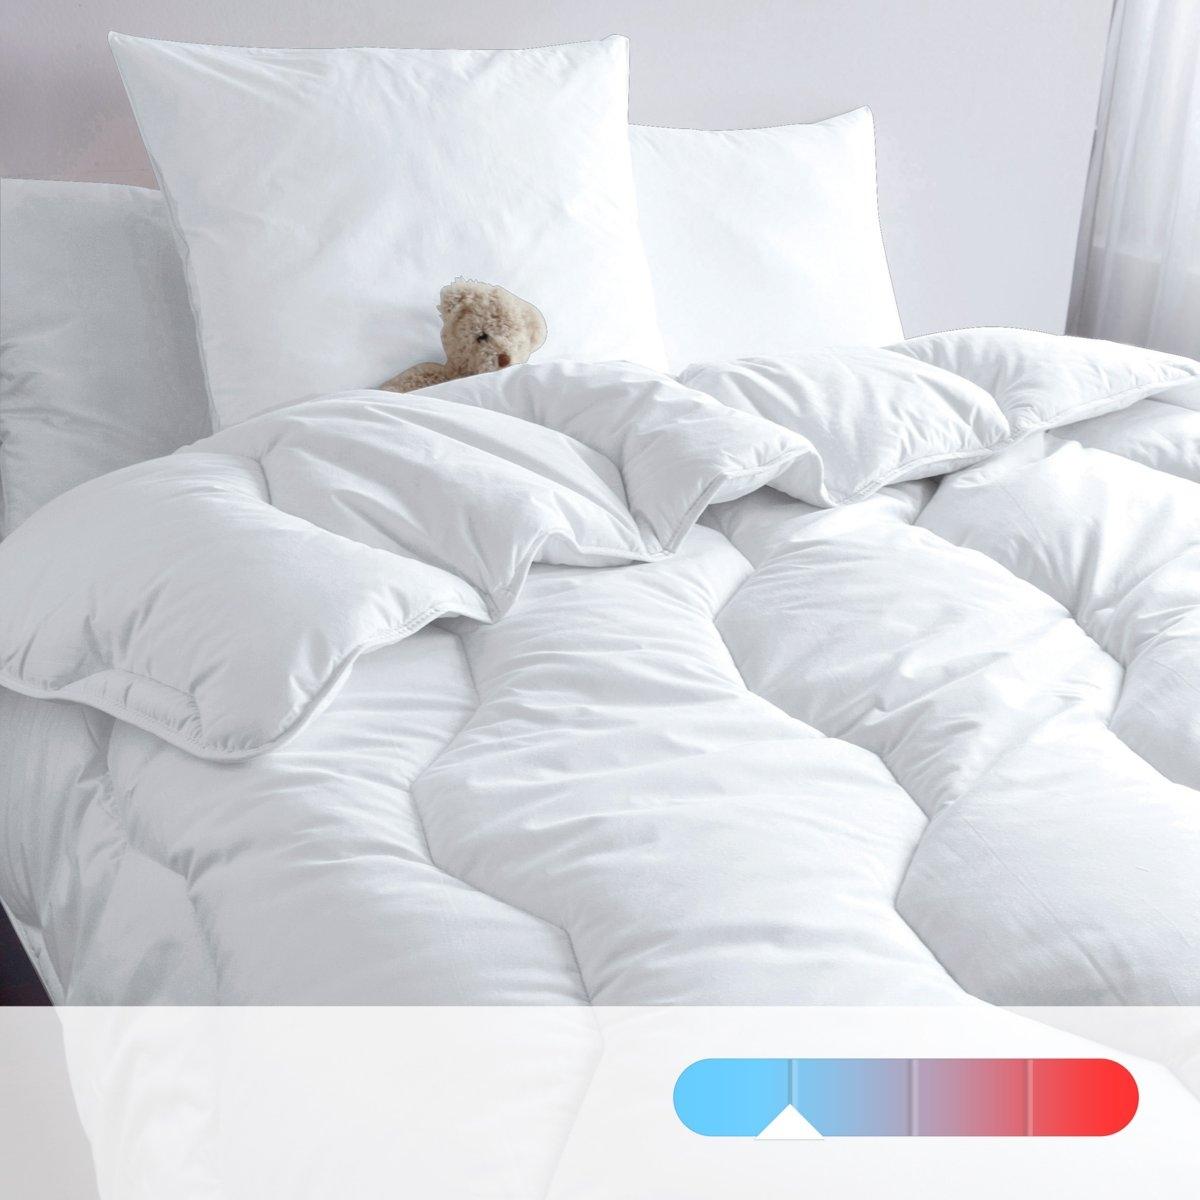 купить Одеяло La Redoute La Redoute 140 x 200 см белый по цене 6349 рублей